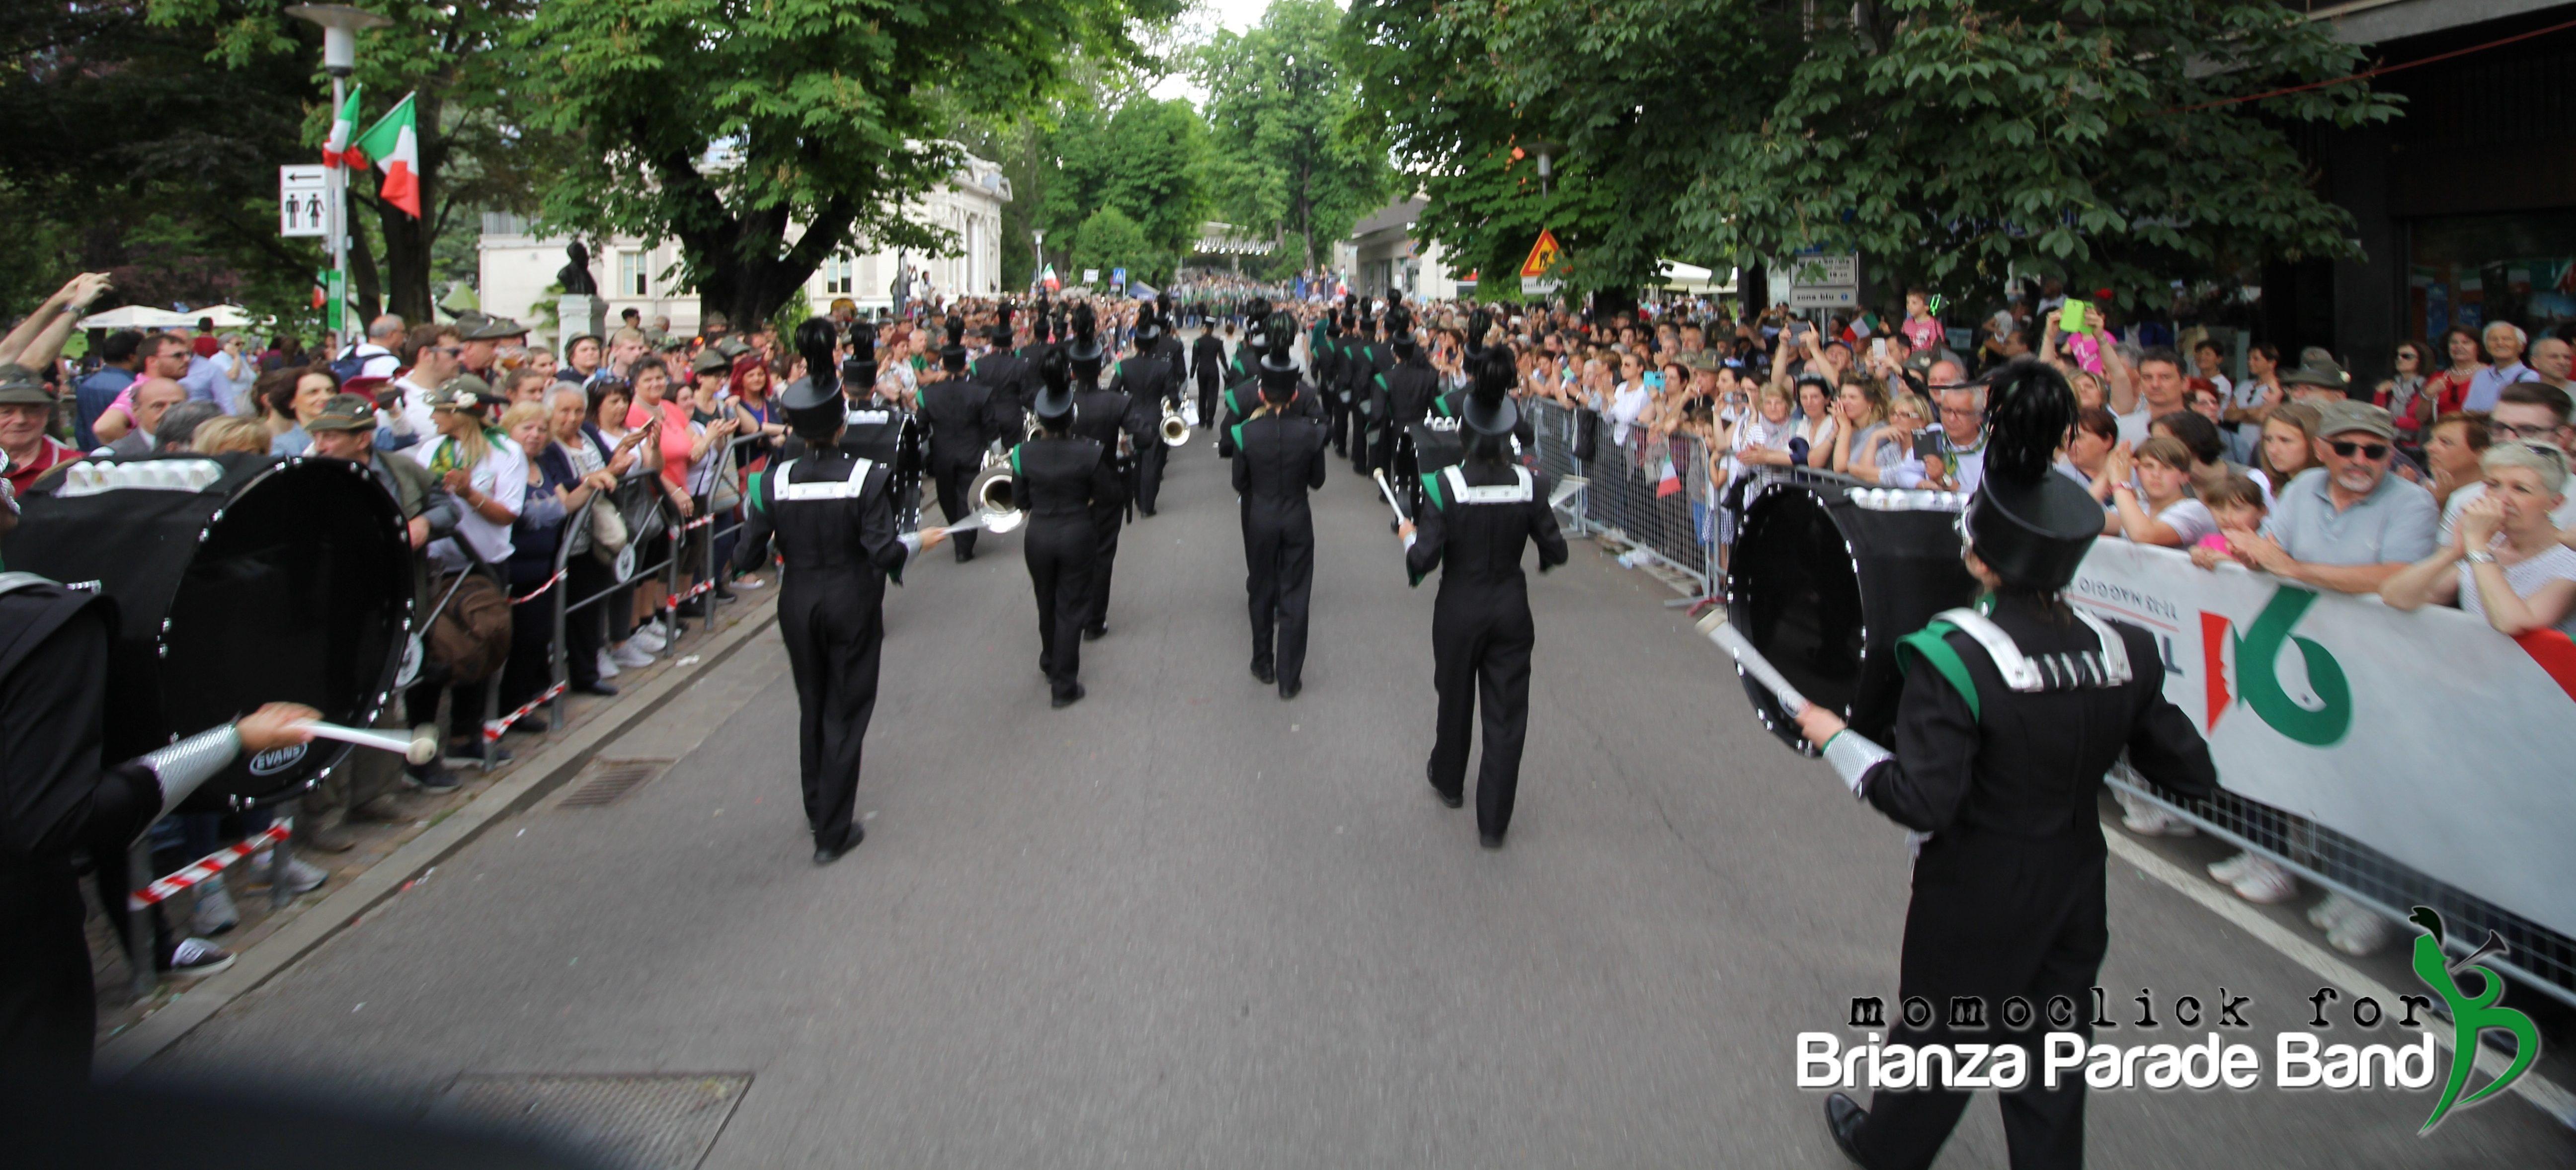 brianza Parade Band trento